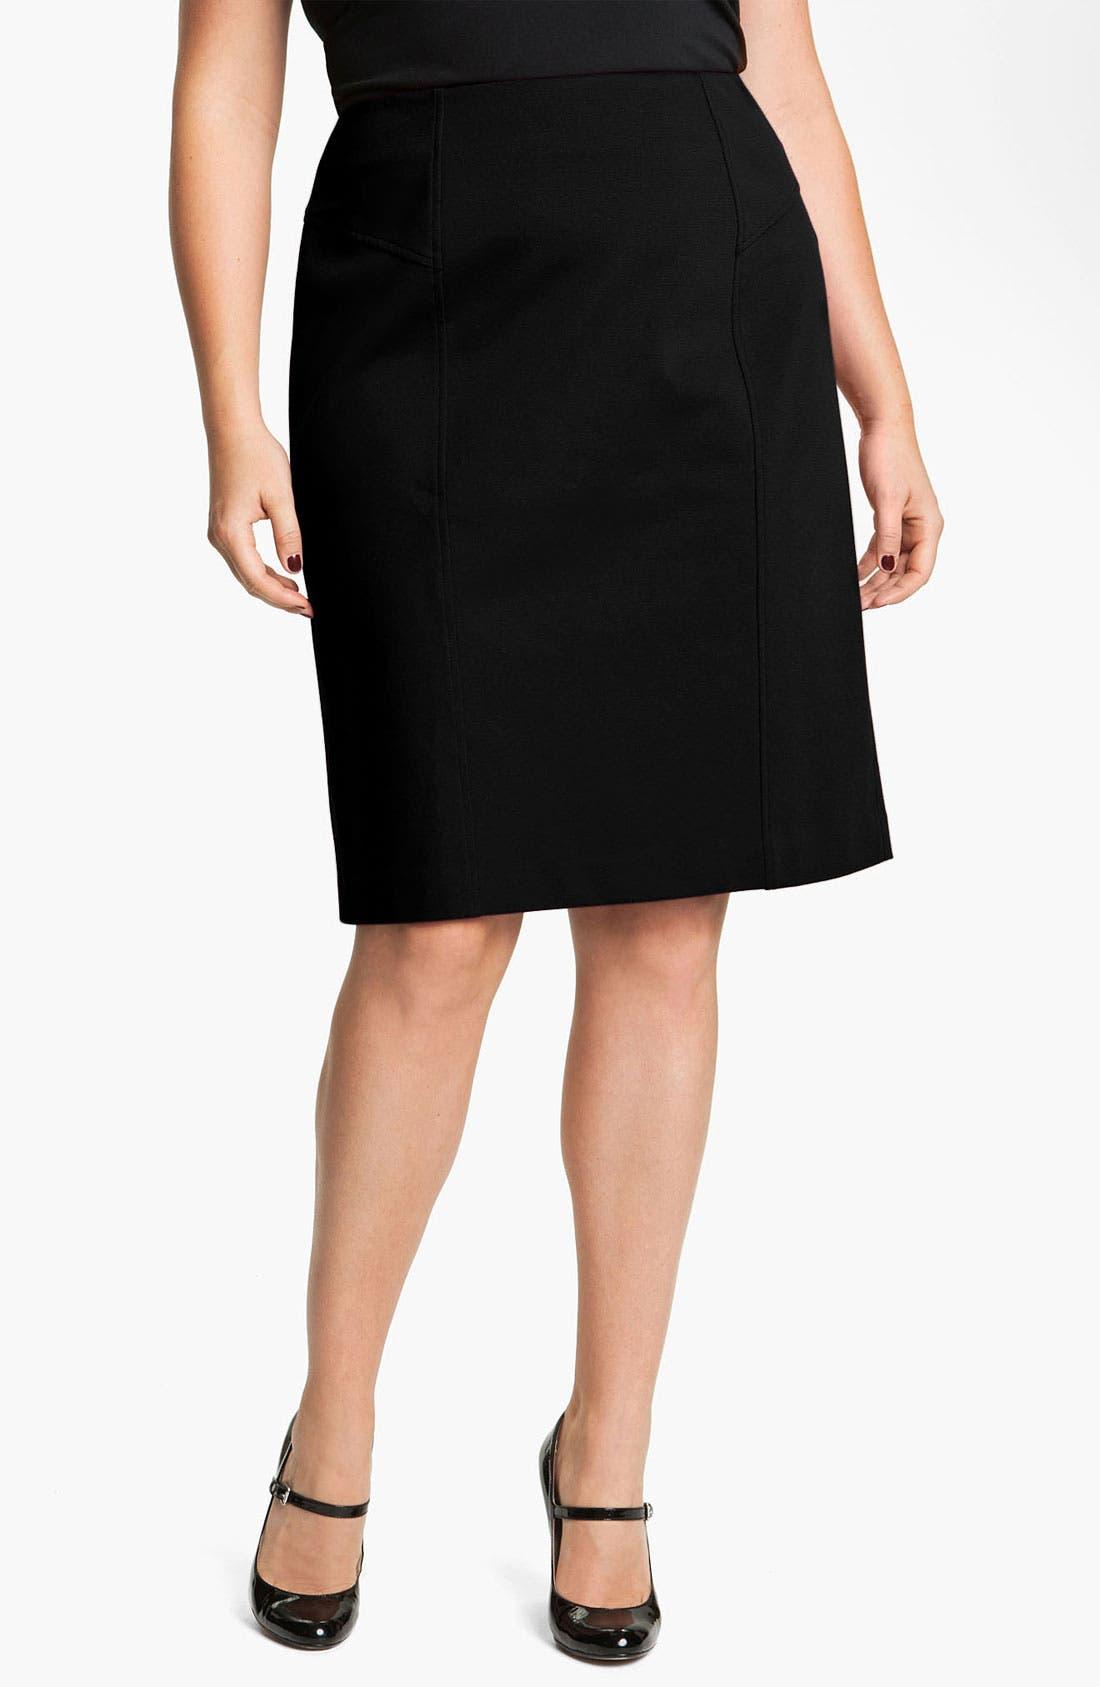 Alternate Image 1 Selected - Sejour Seamed Ponte Knit Skirt (Plus)